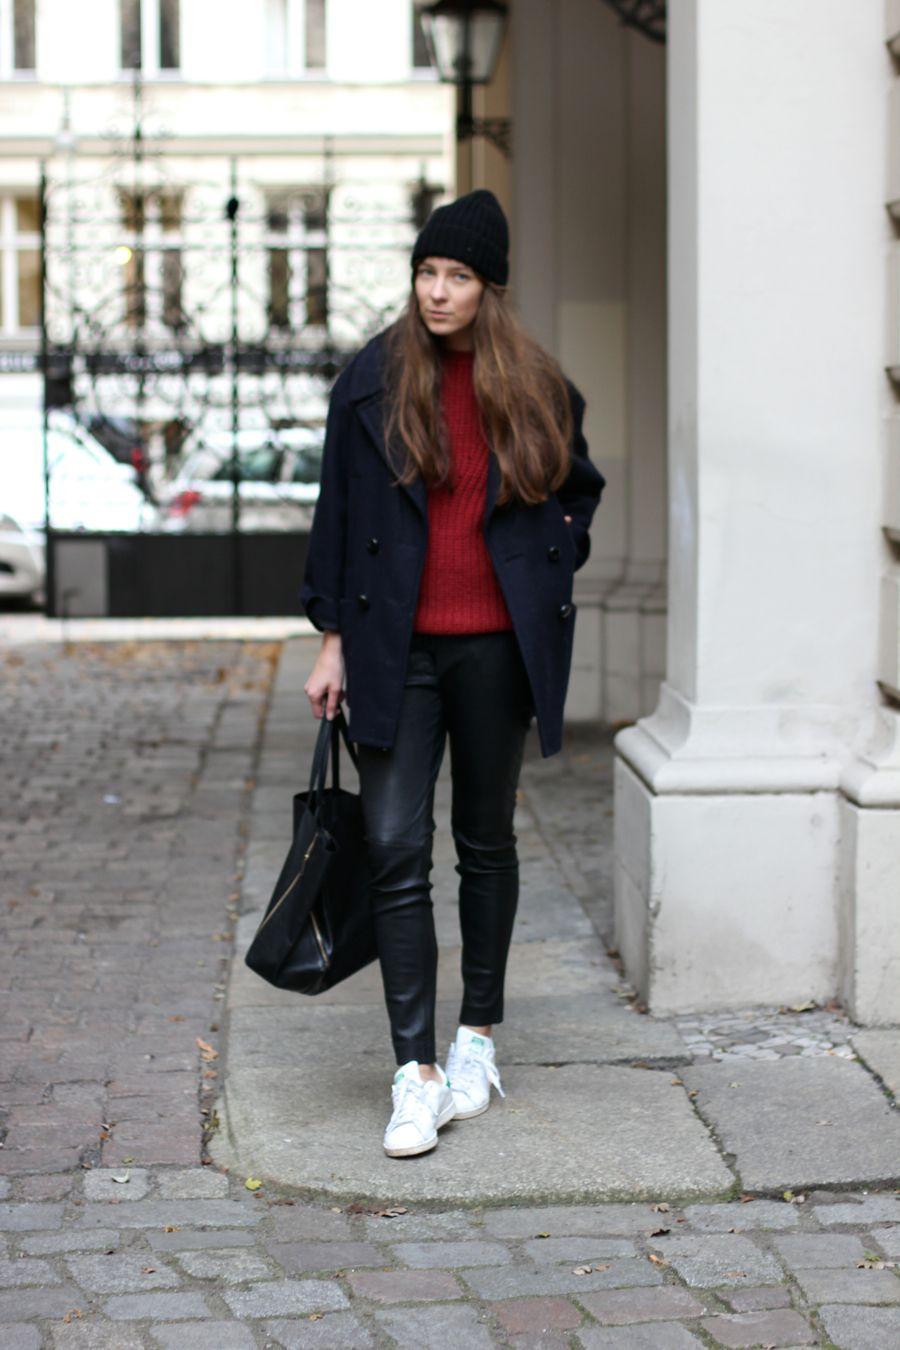 #street #style #black #red